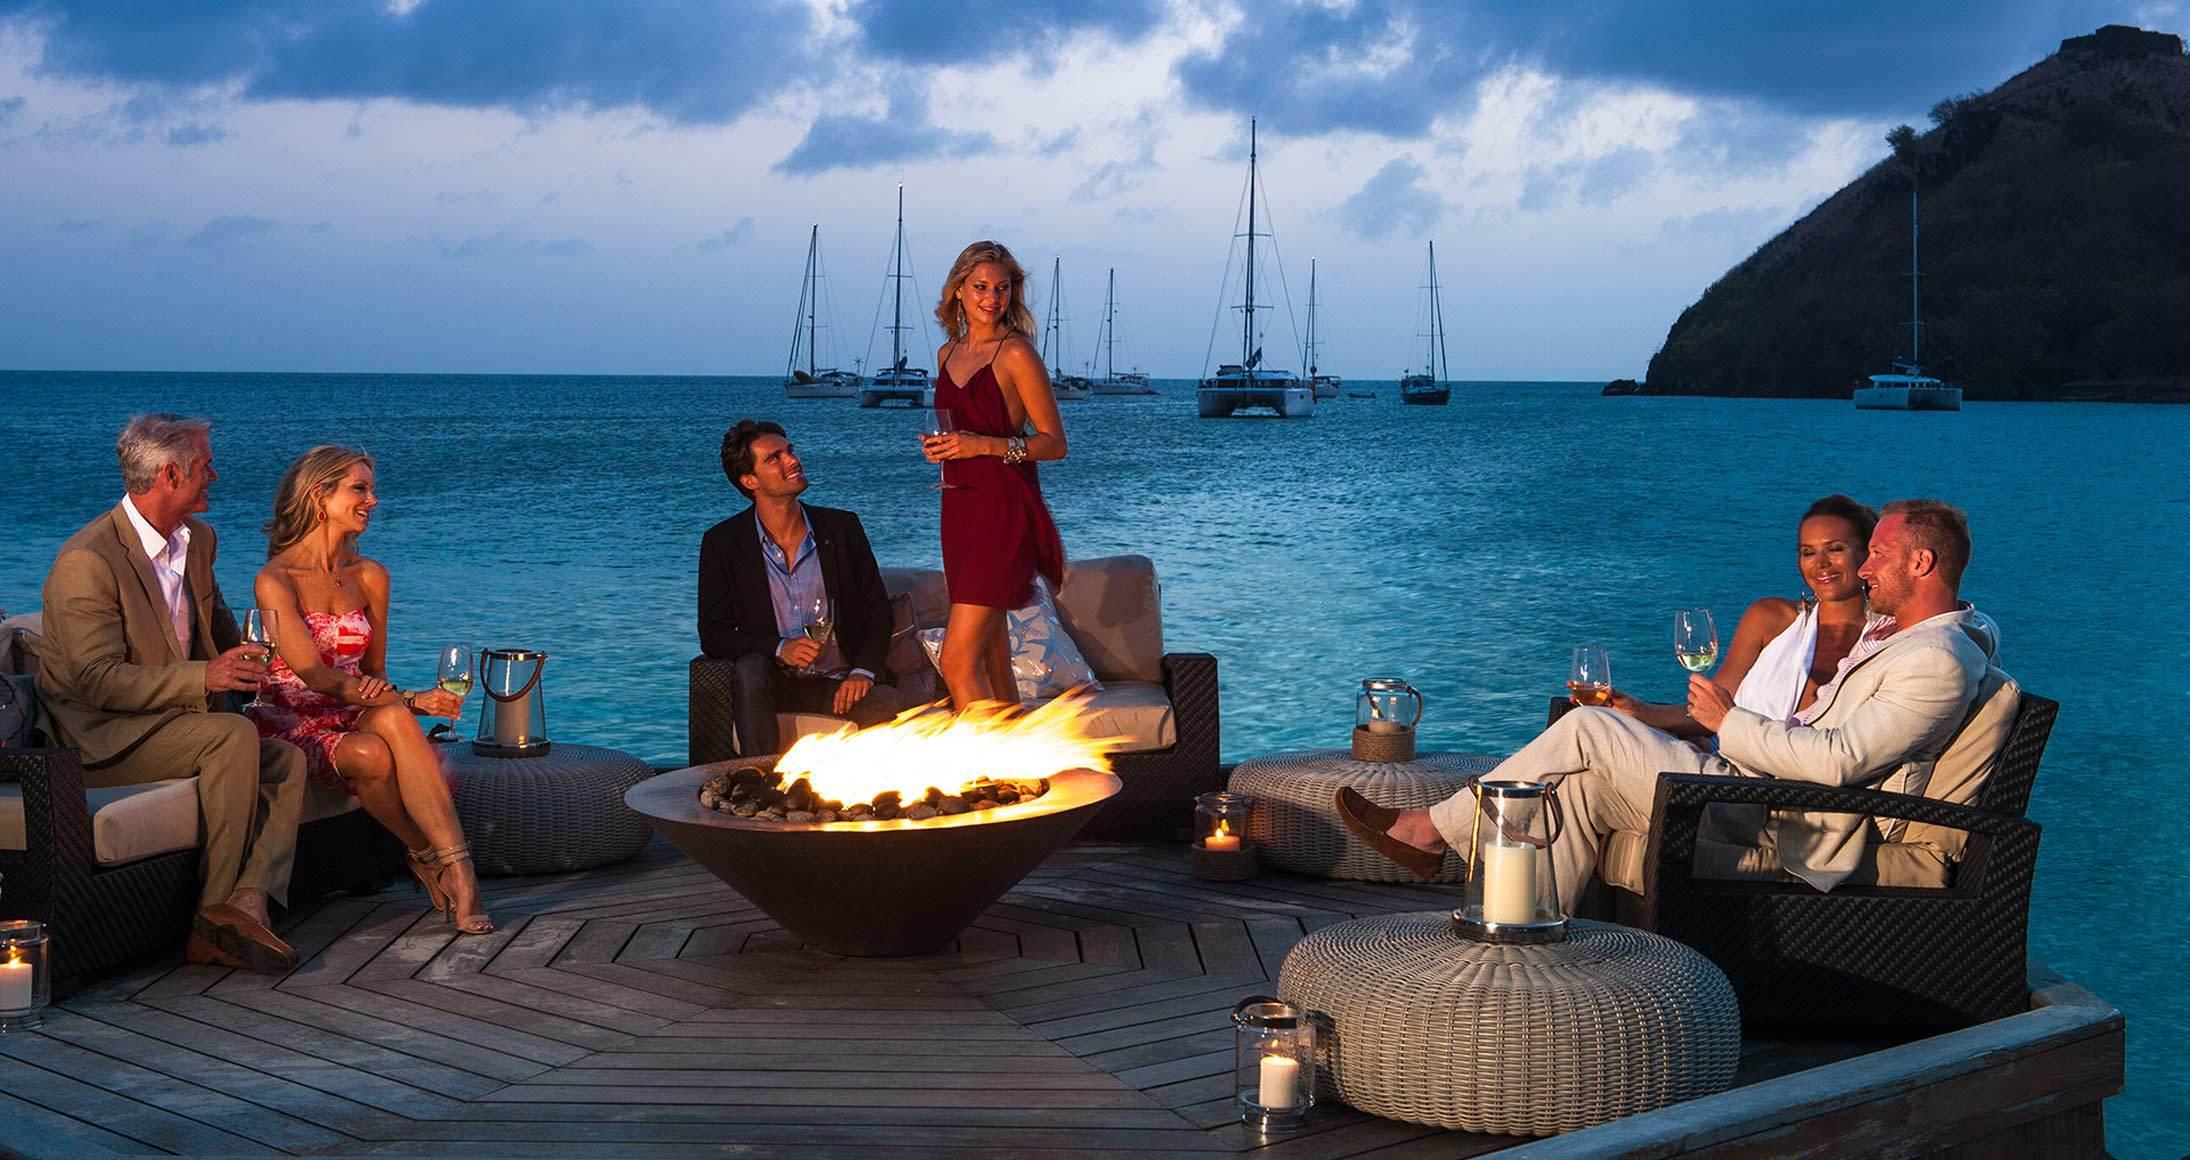 Sandals Grande St  Lucian - All-Inclusive Luxury Resort in